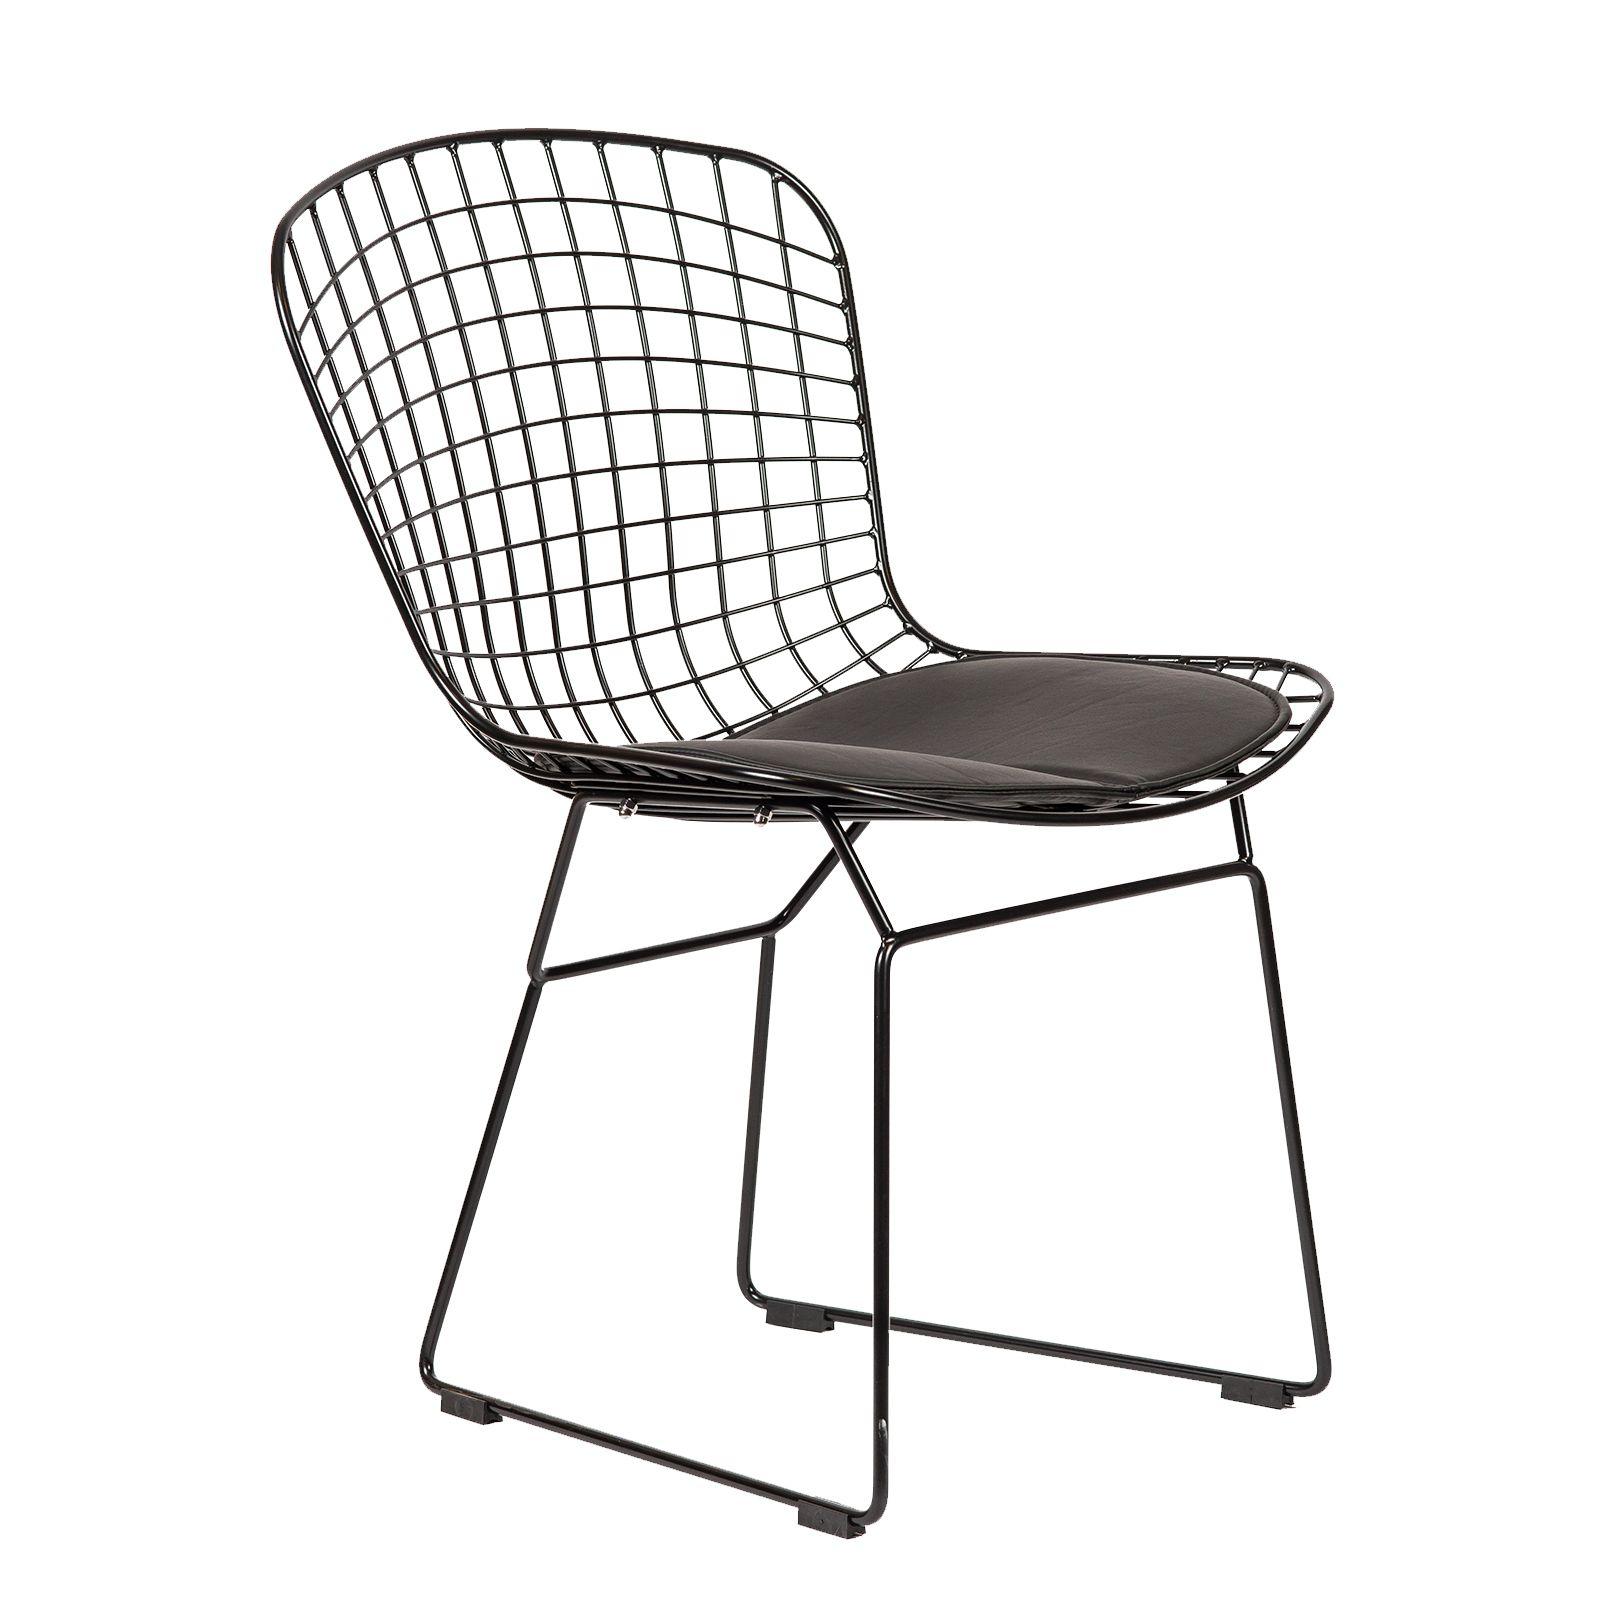 mc 020a chair basiccollection chair metal black horeca